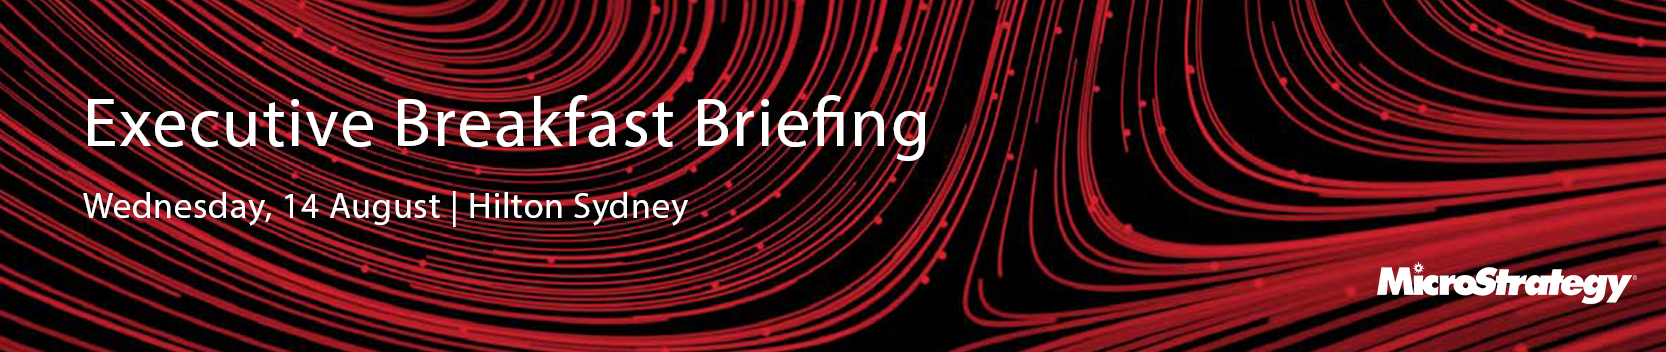 Executive Breakfast Briefing - Sydney